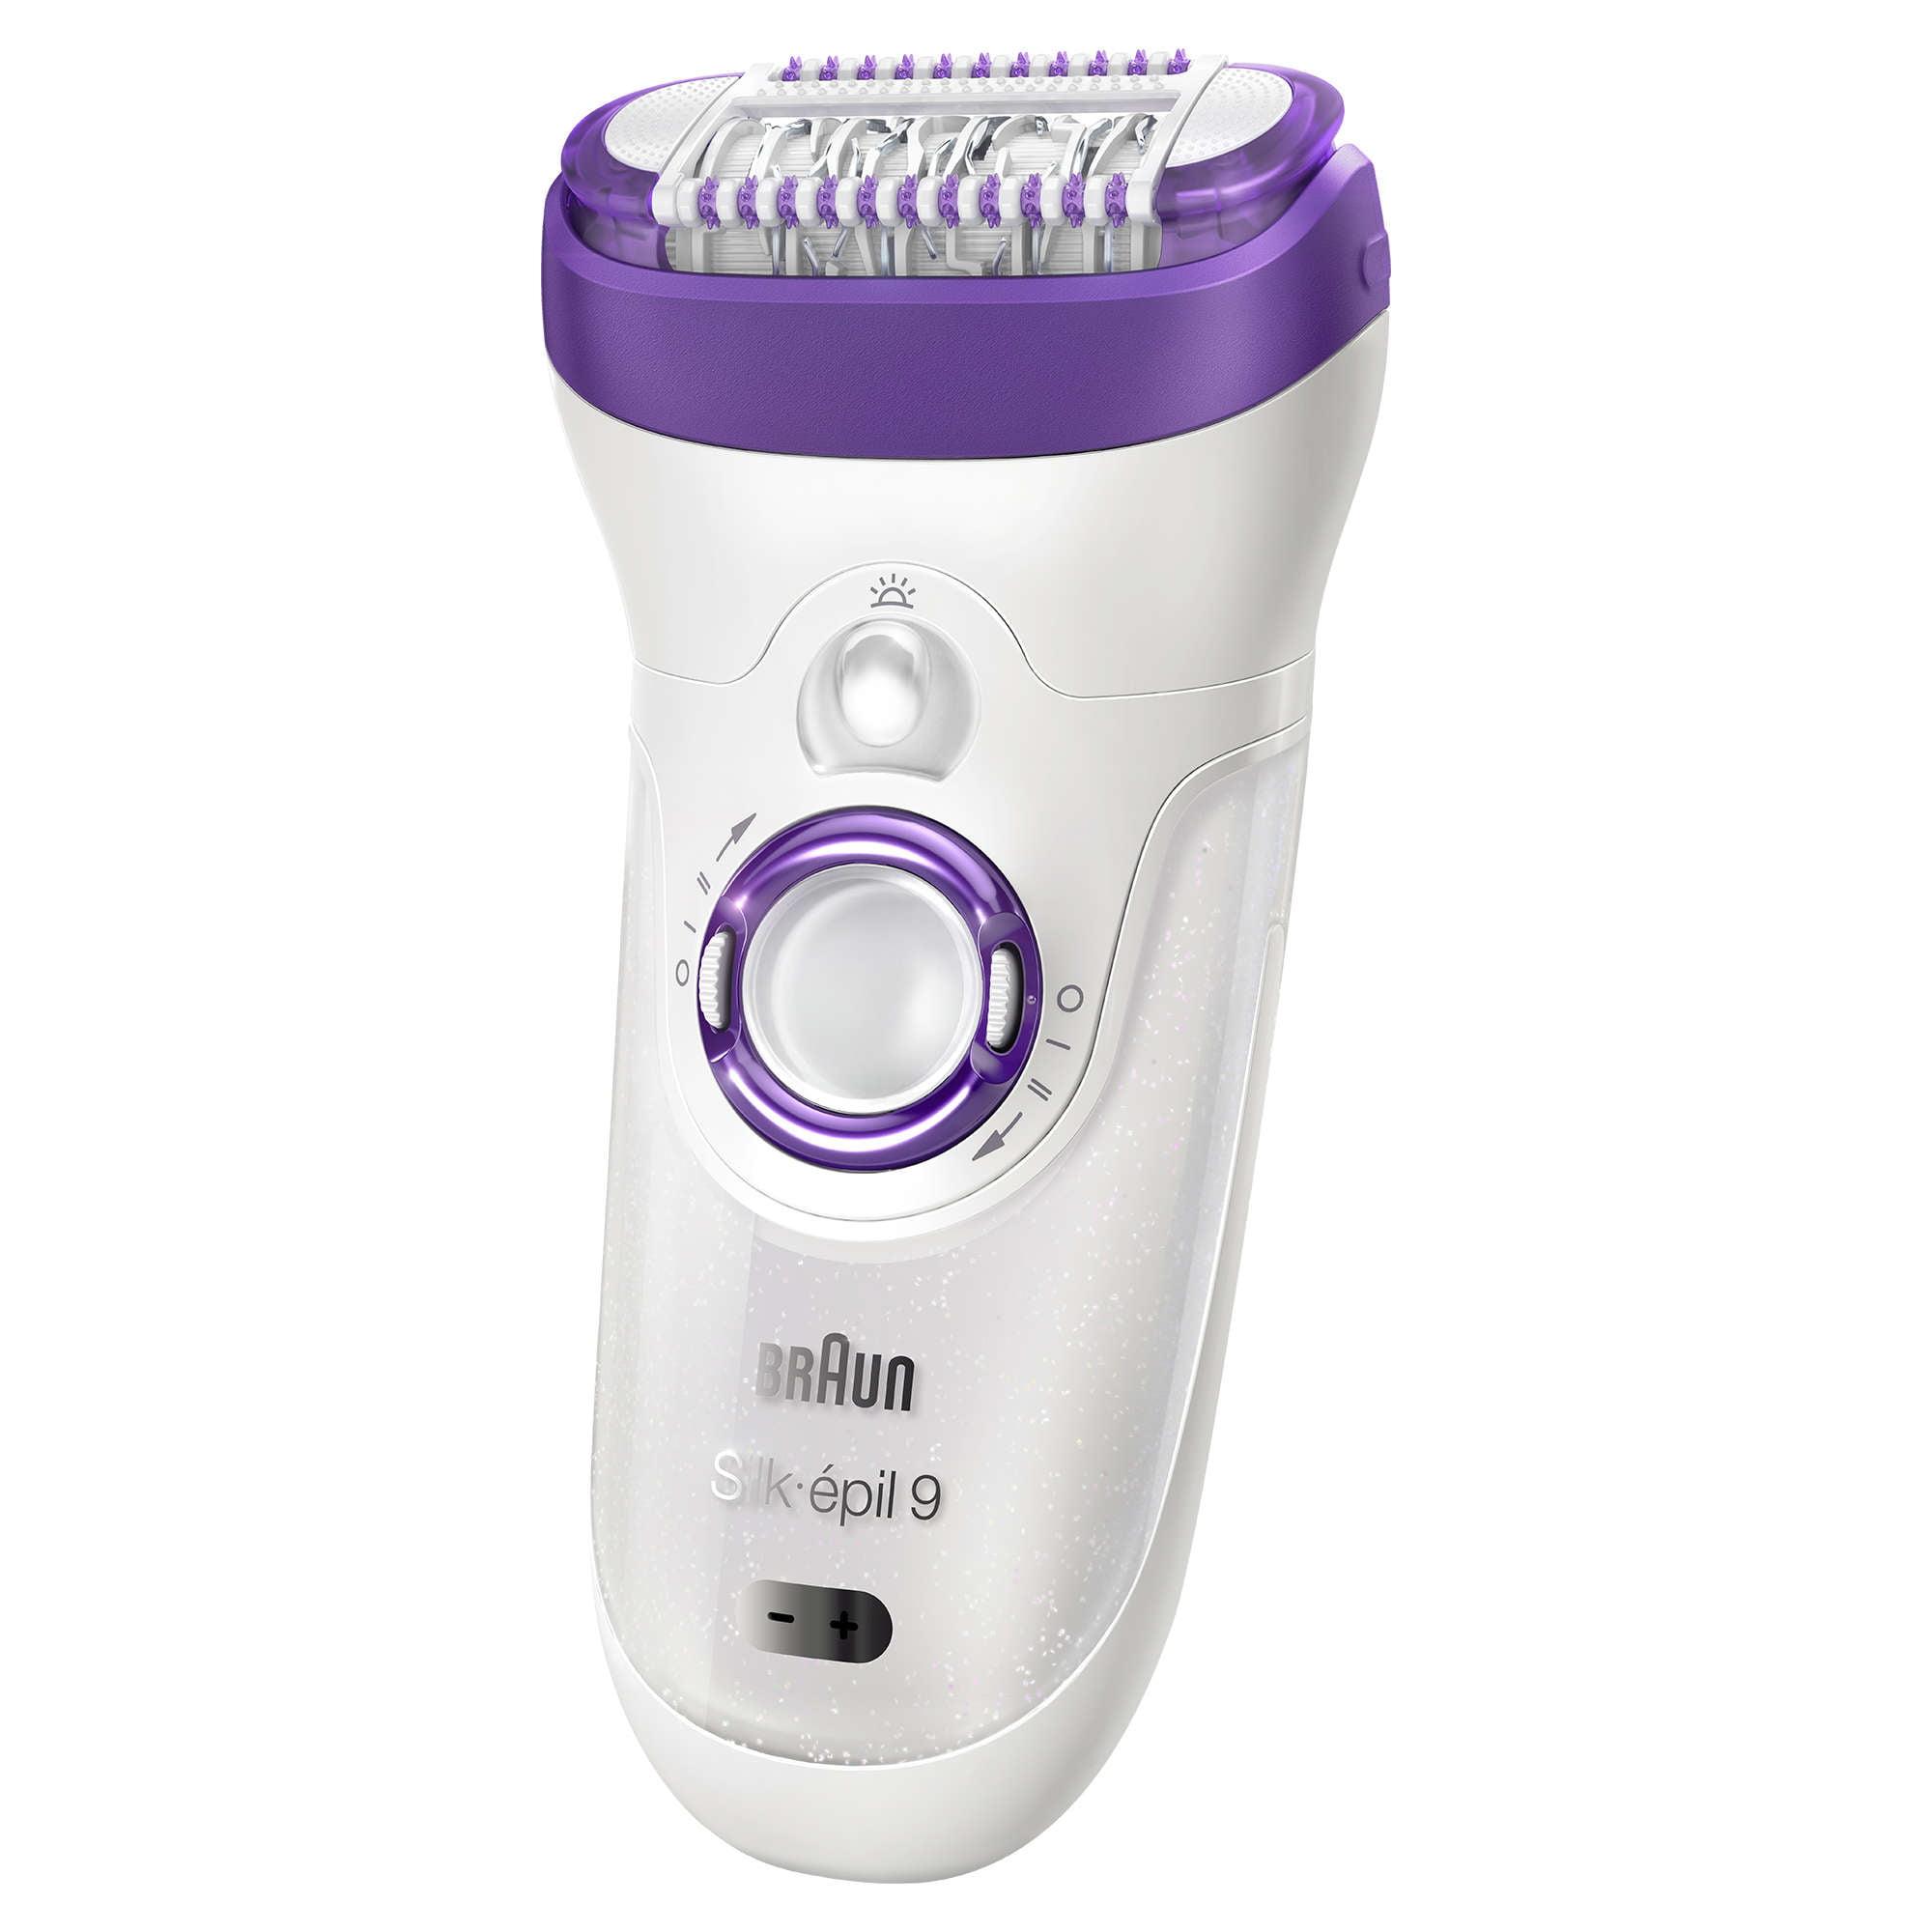 Braun Silk Epil 9 9-579 Women's Wet & Dry Cordless Epilator / Epilation plus 7 extras